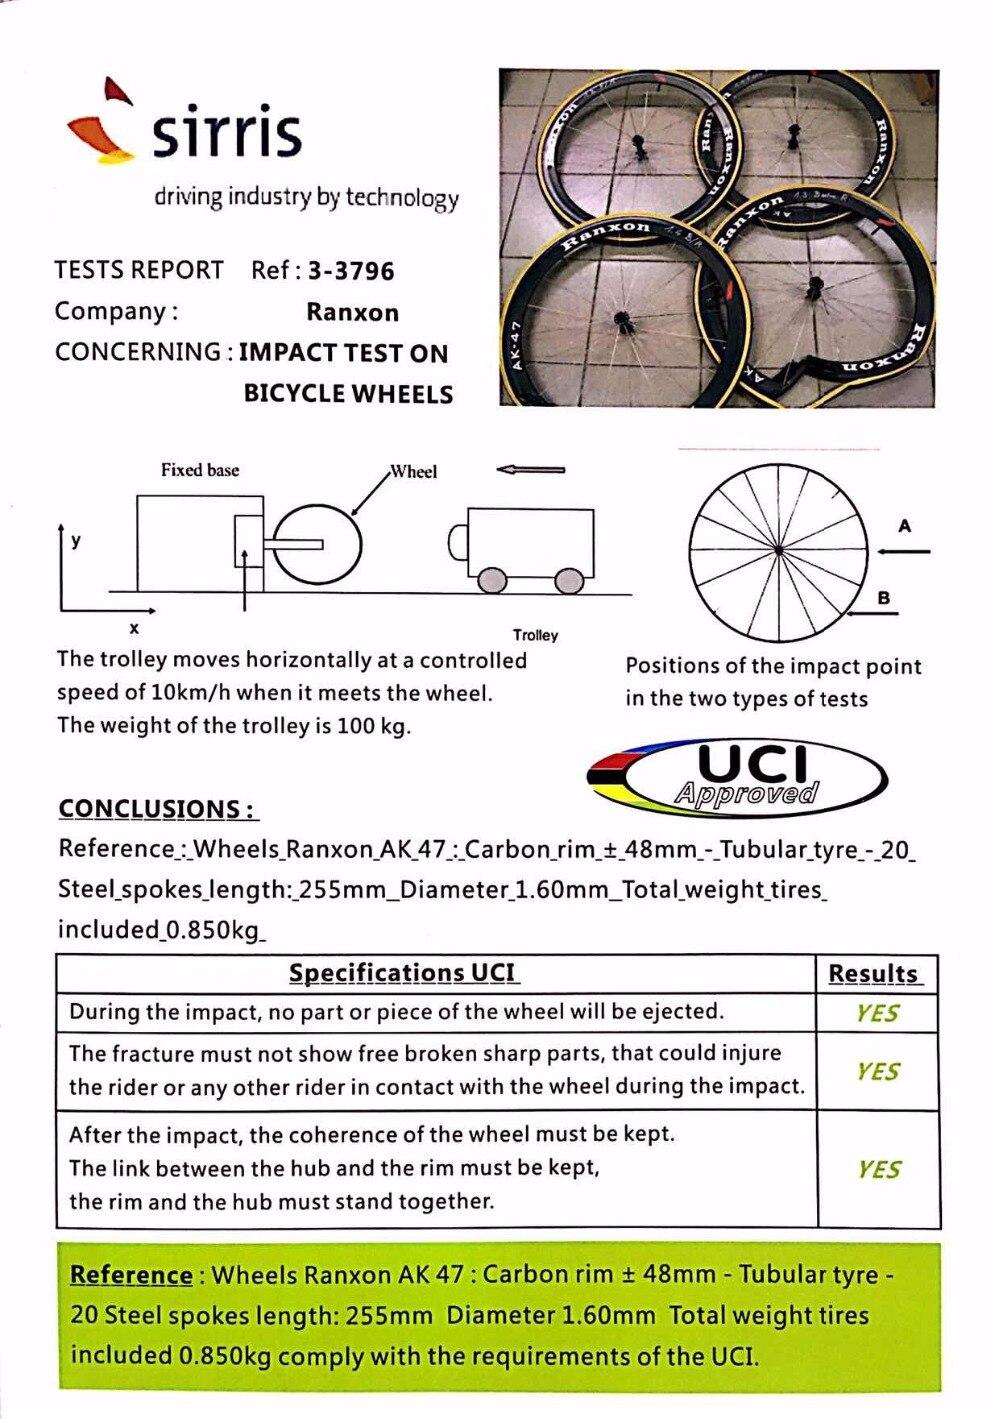 HTB1Xm.mgYZnBKNjSZFrq6yRLFXam - Road Bike 38mm Deep Carbon Wheels Tubeless Wheel Super Light 700C Basalt Brake Surface Bicycle Carbon Wheelset 2 Year Warranty